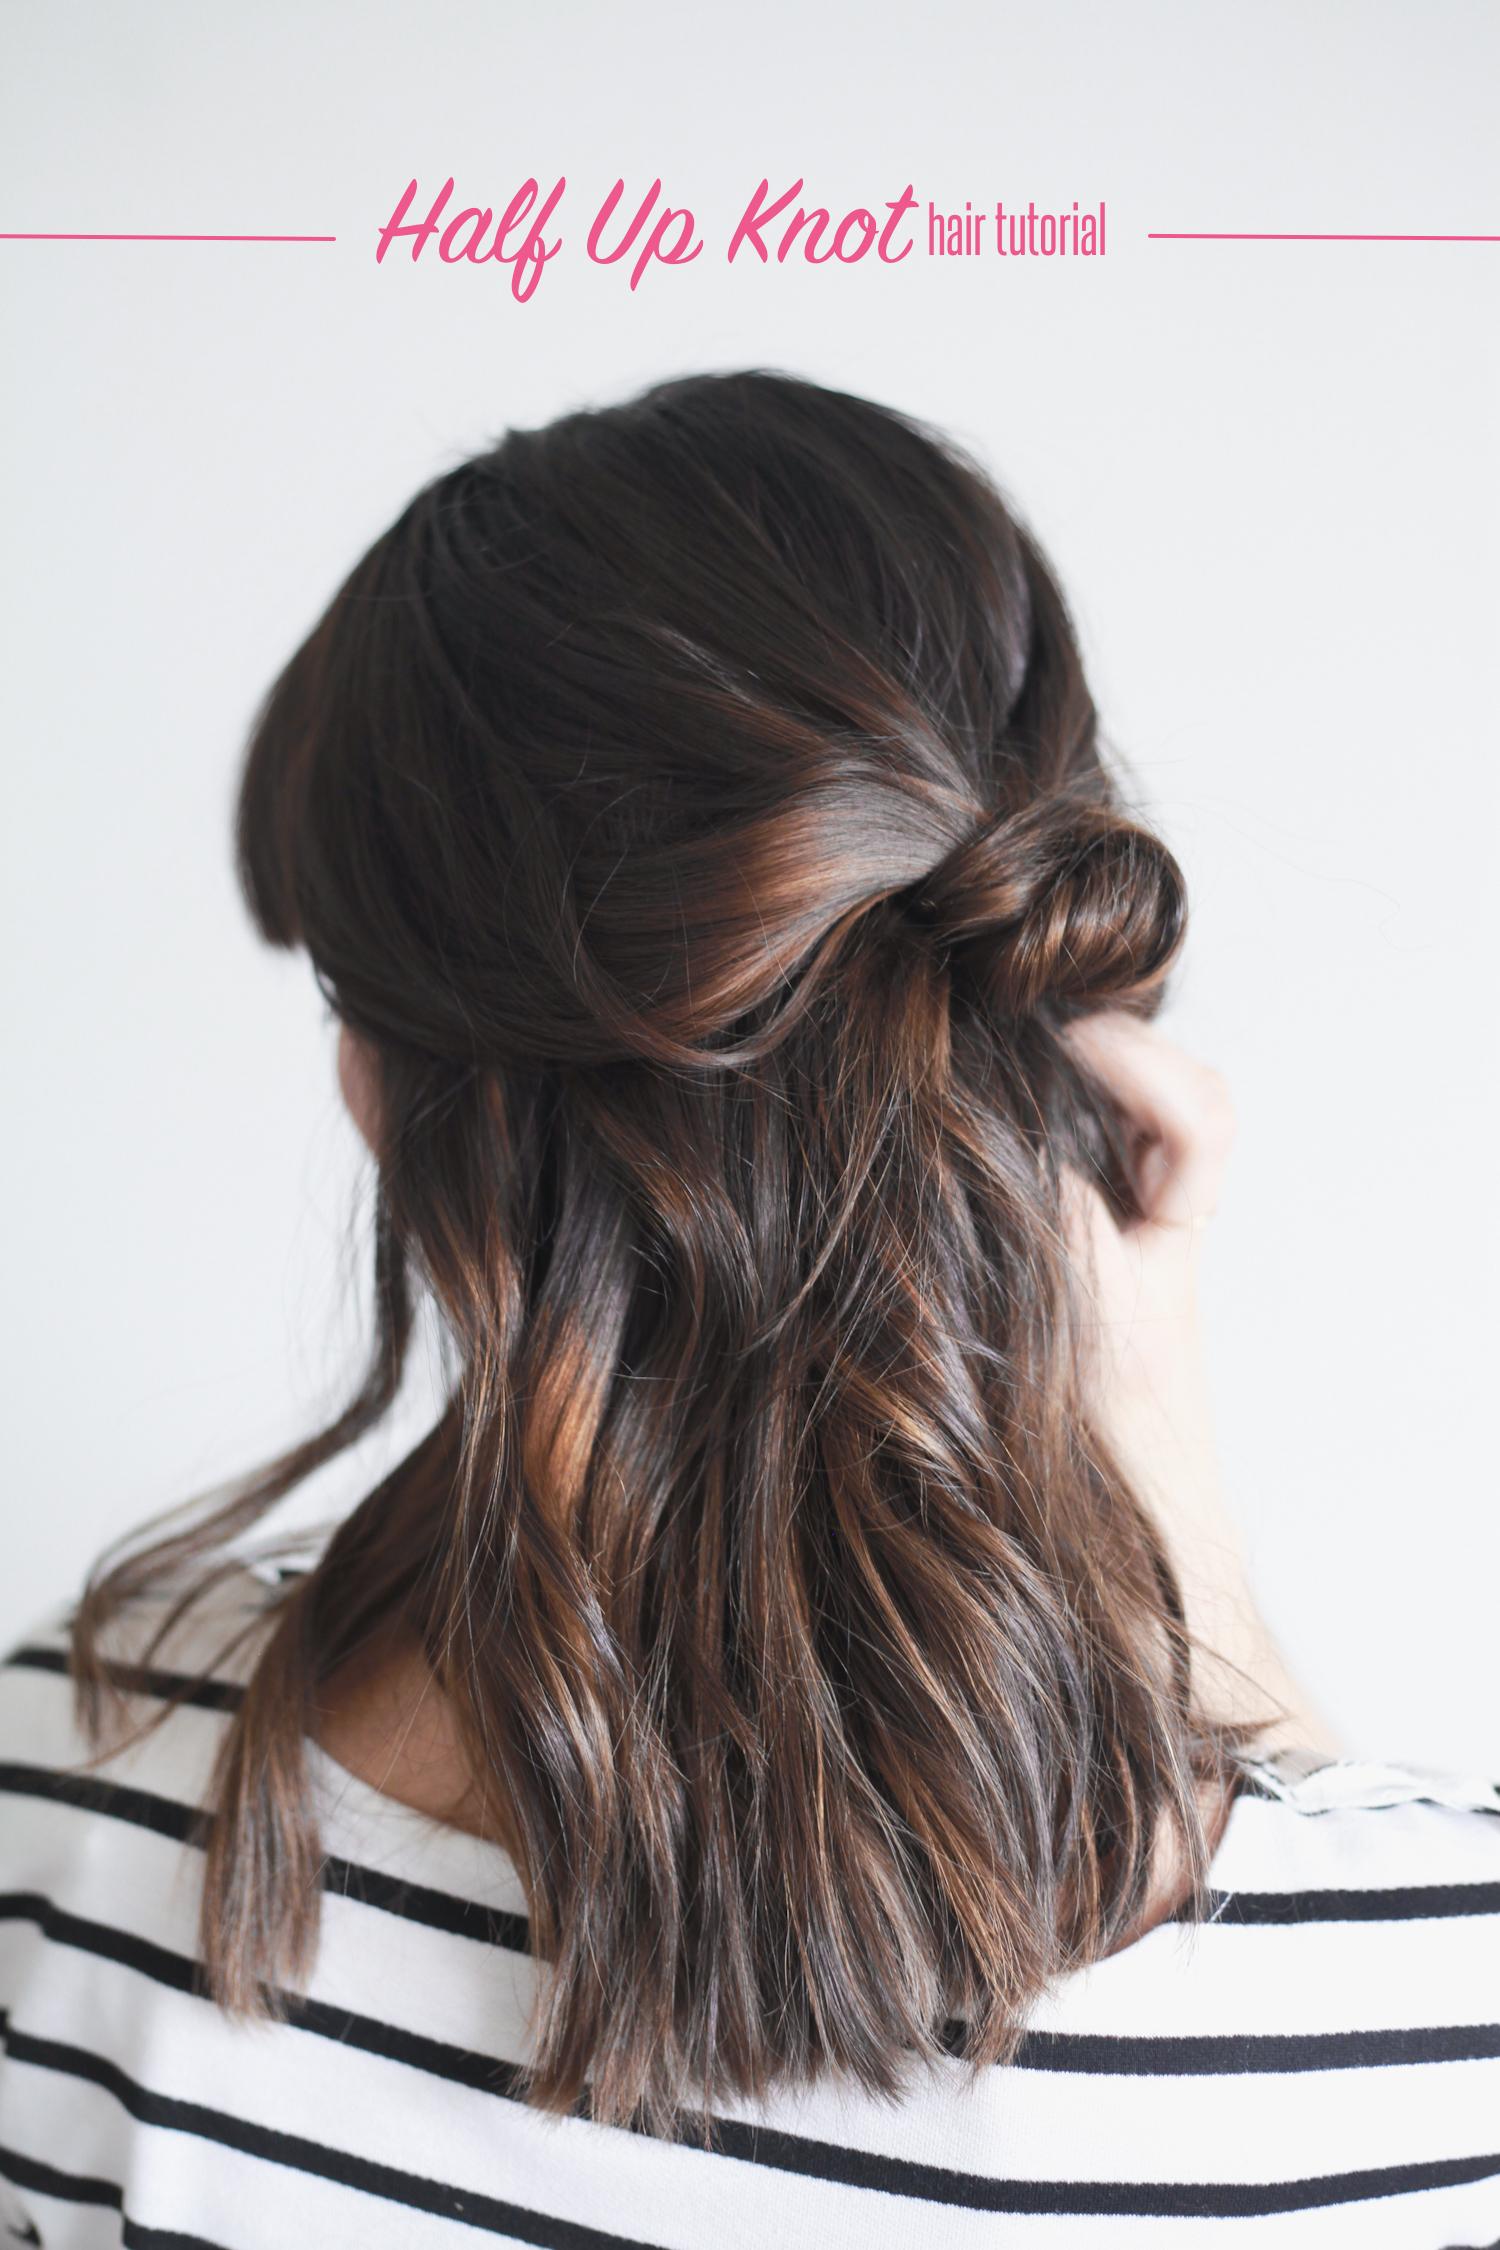 hair tutorial hfalf up knot.jpeg